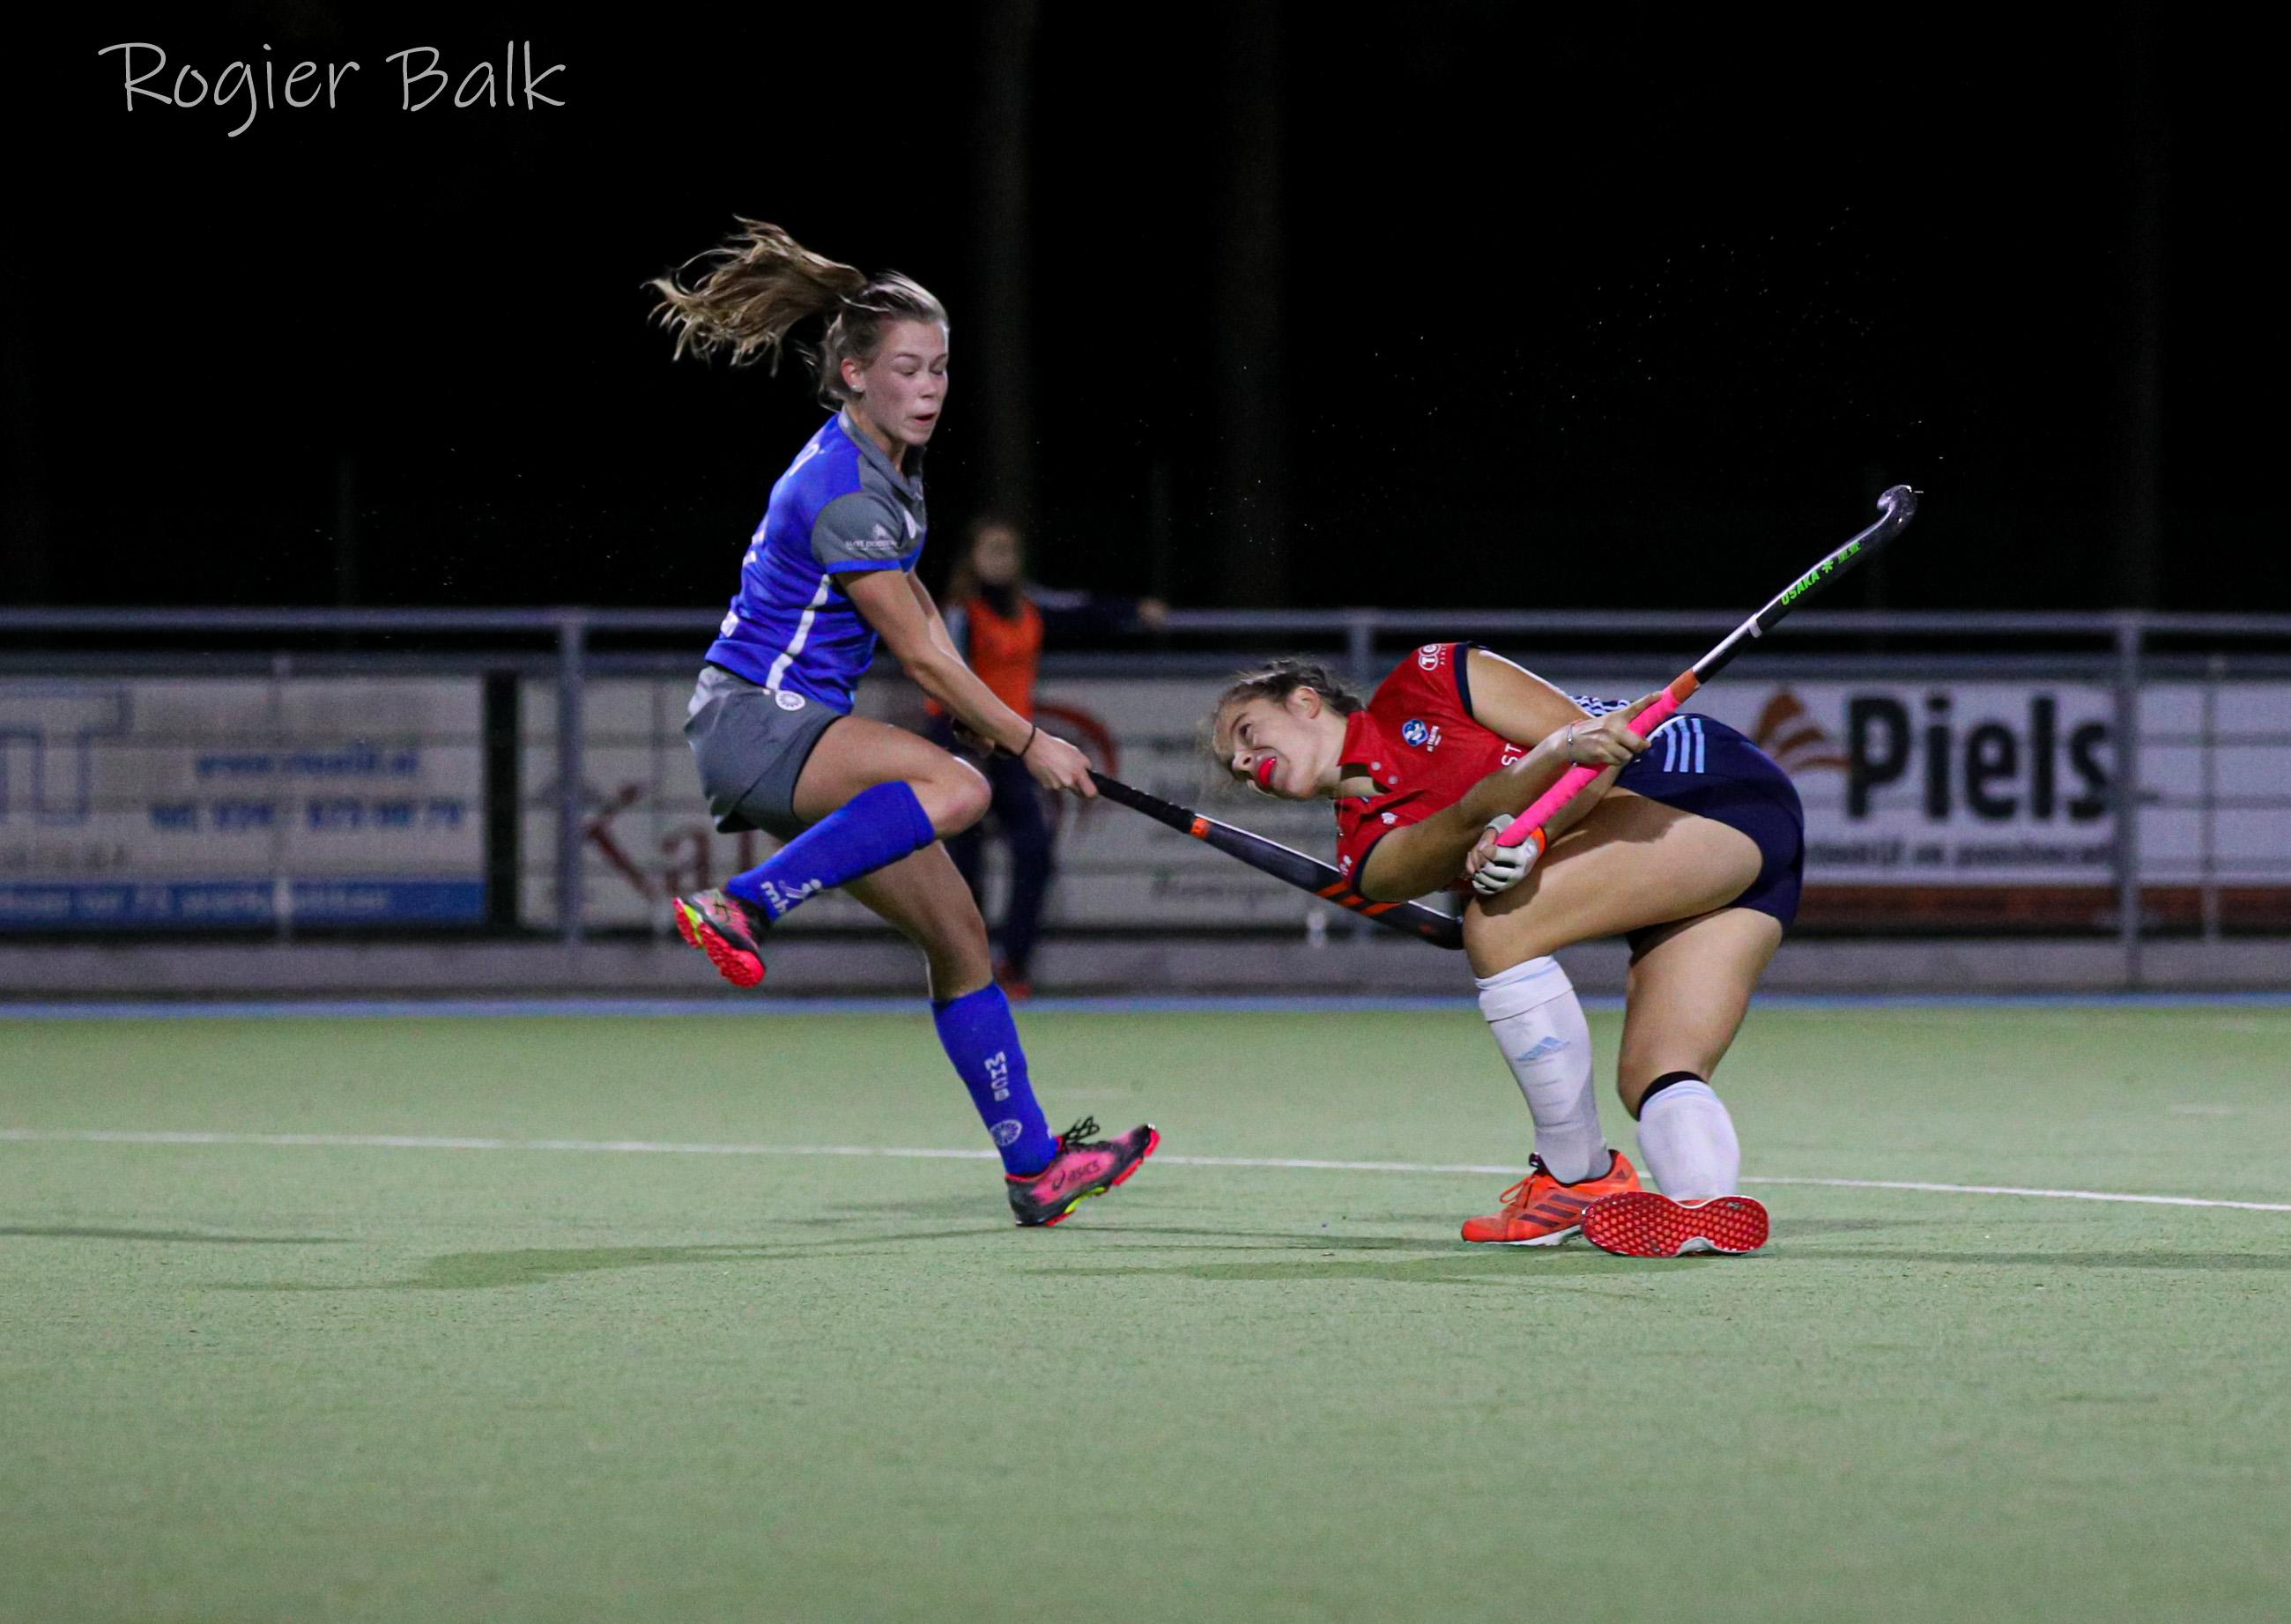 HC Tilburg, beuningen, dames1, gold cup, seiz19-20